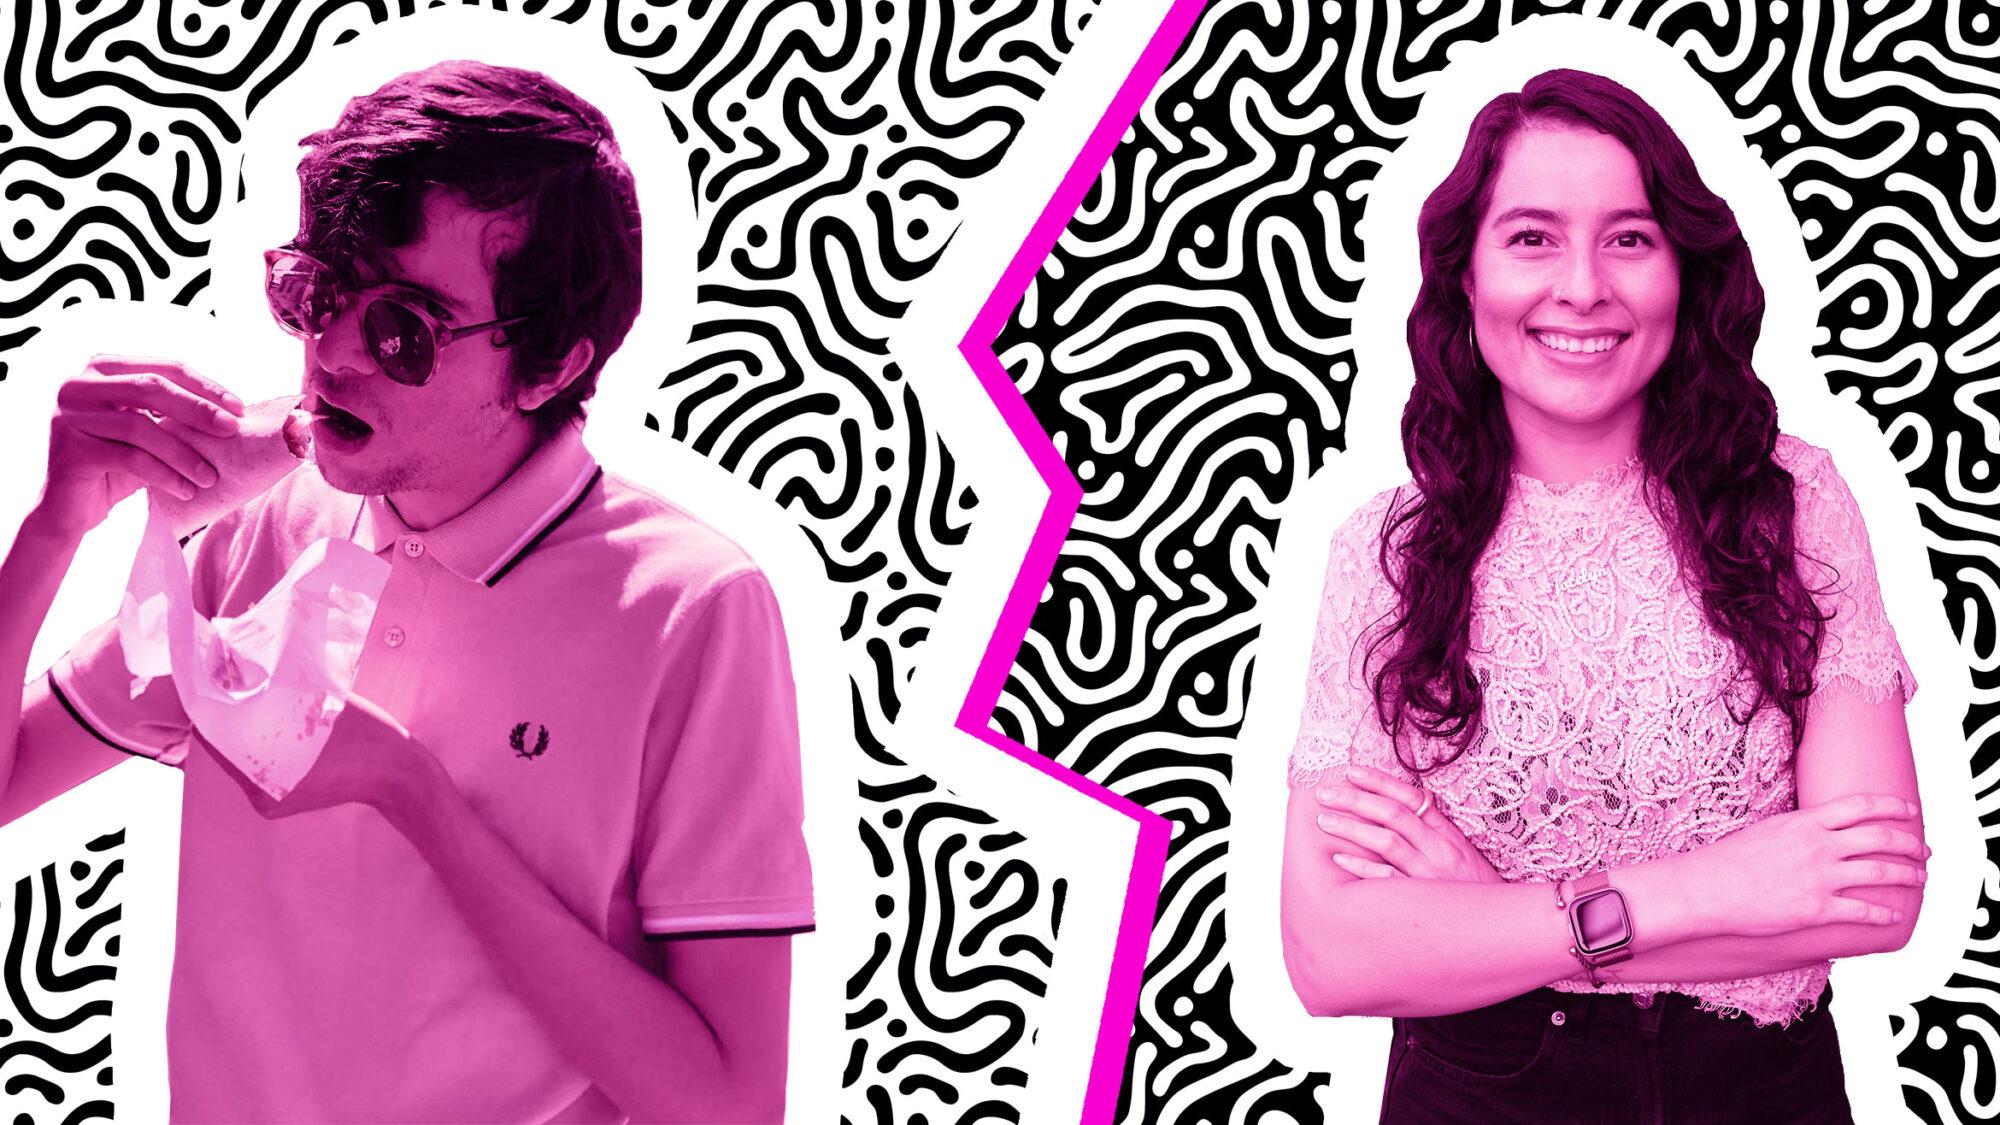 Article-Chef-Javier-Cabral-Jocelyn-Ramirez